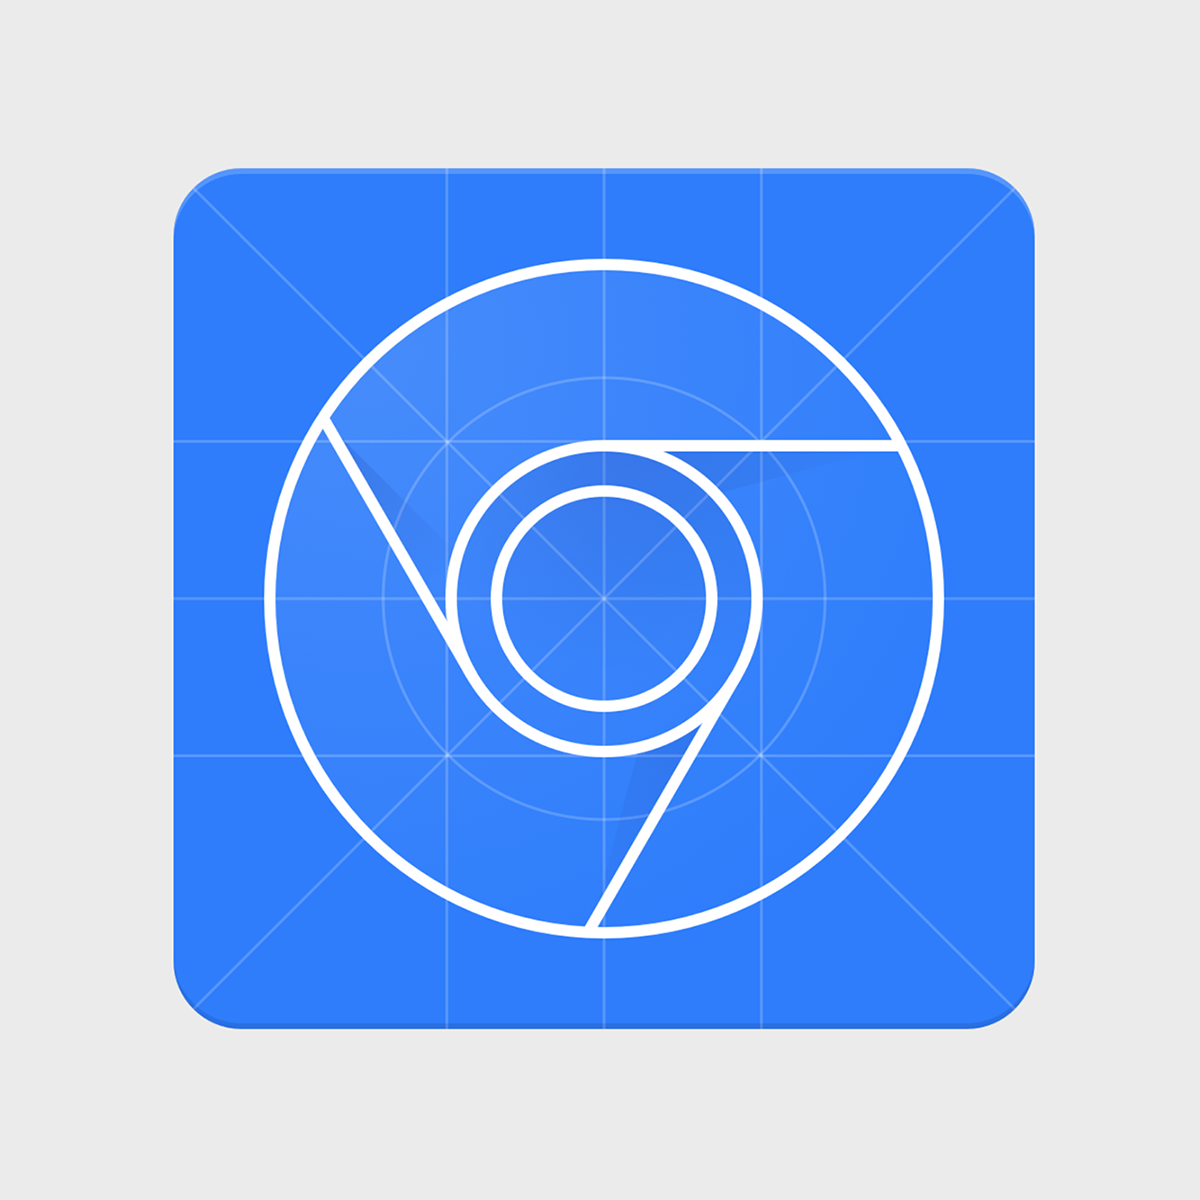 Chrome DevTools - Debugging Node js Application Using ndb